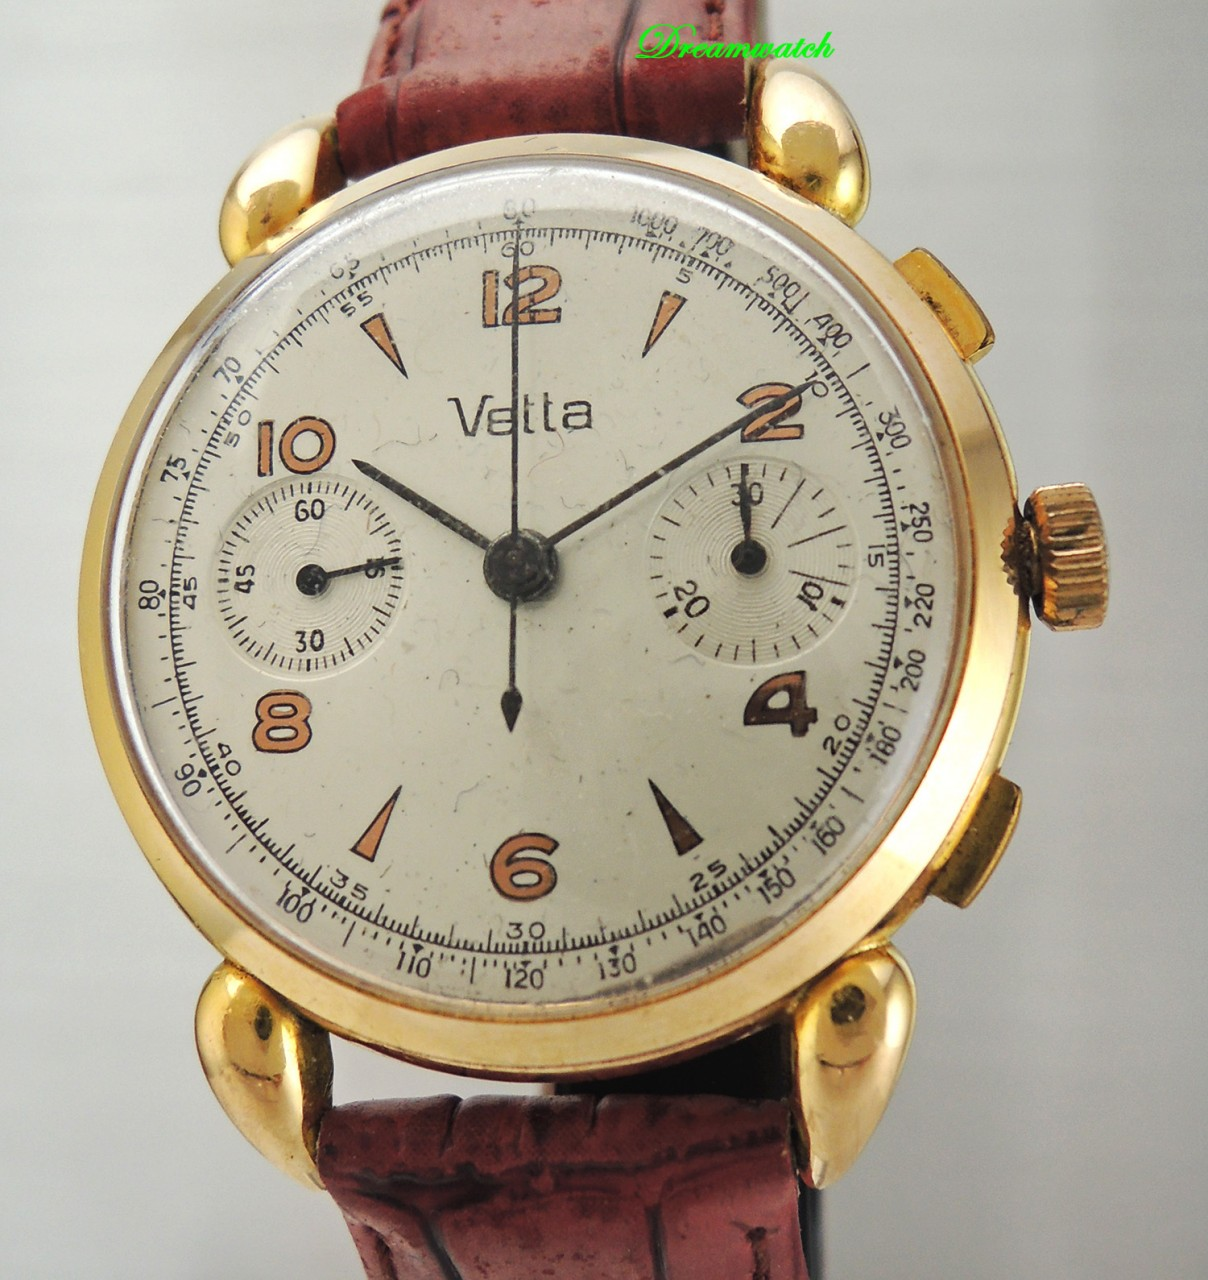 Vetta Chronograph Cal.22 -Gold 18k